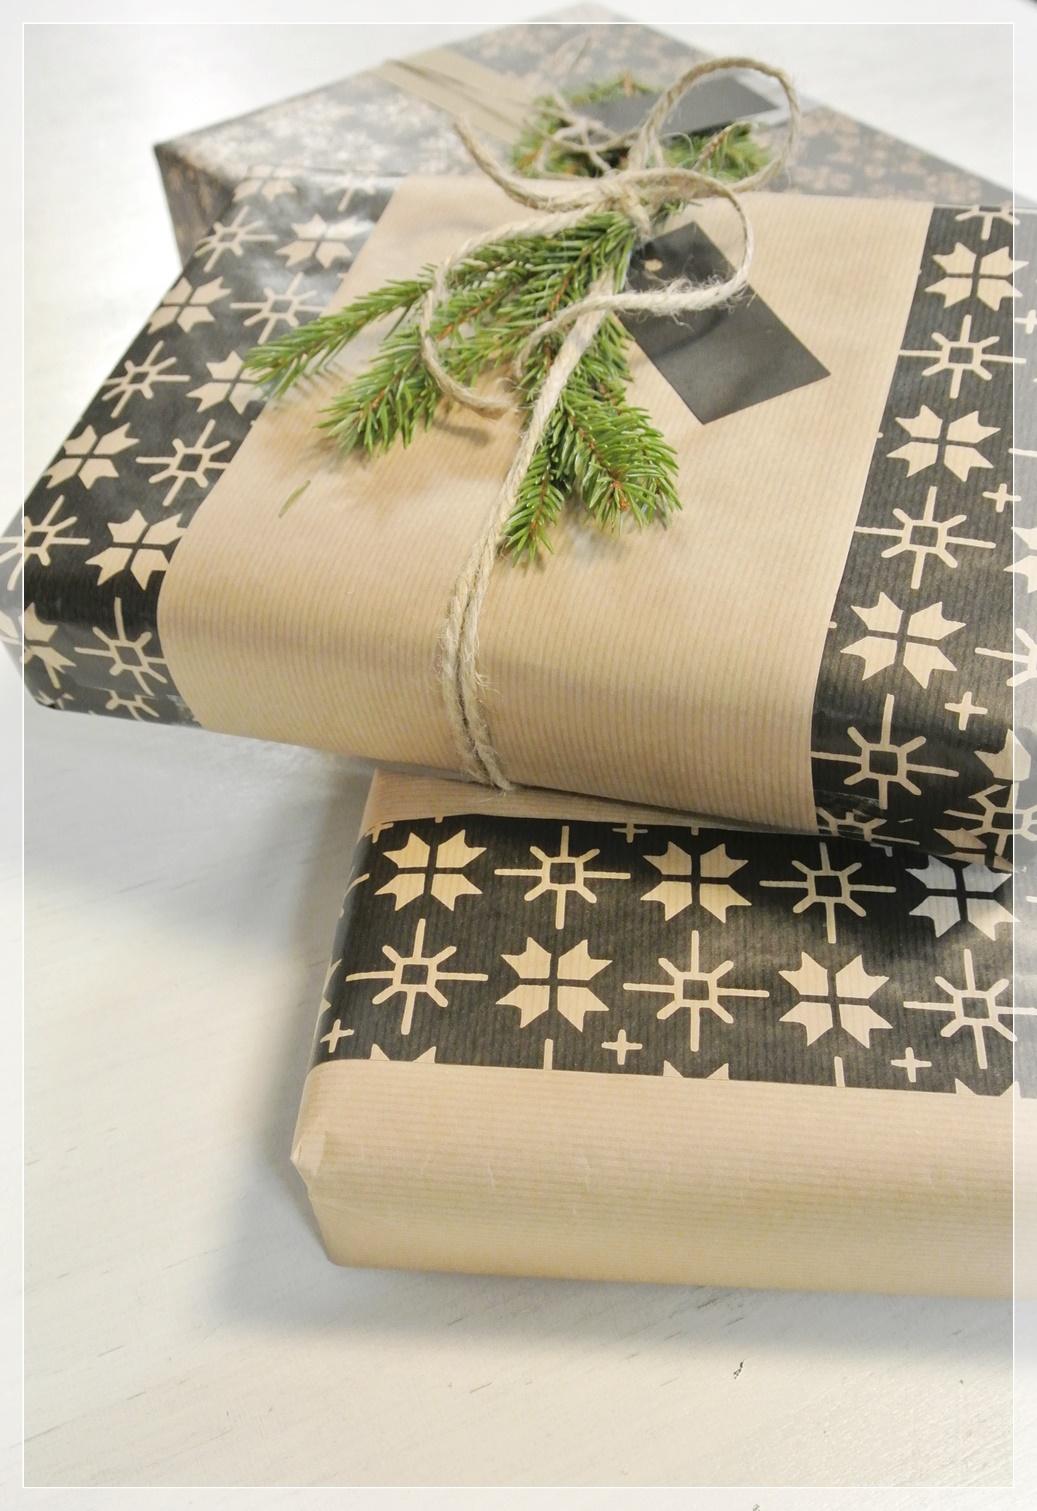 joulupaketointi, joulu, christmas, lahjapaketti, present